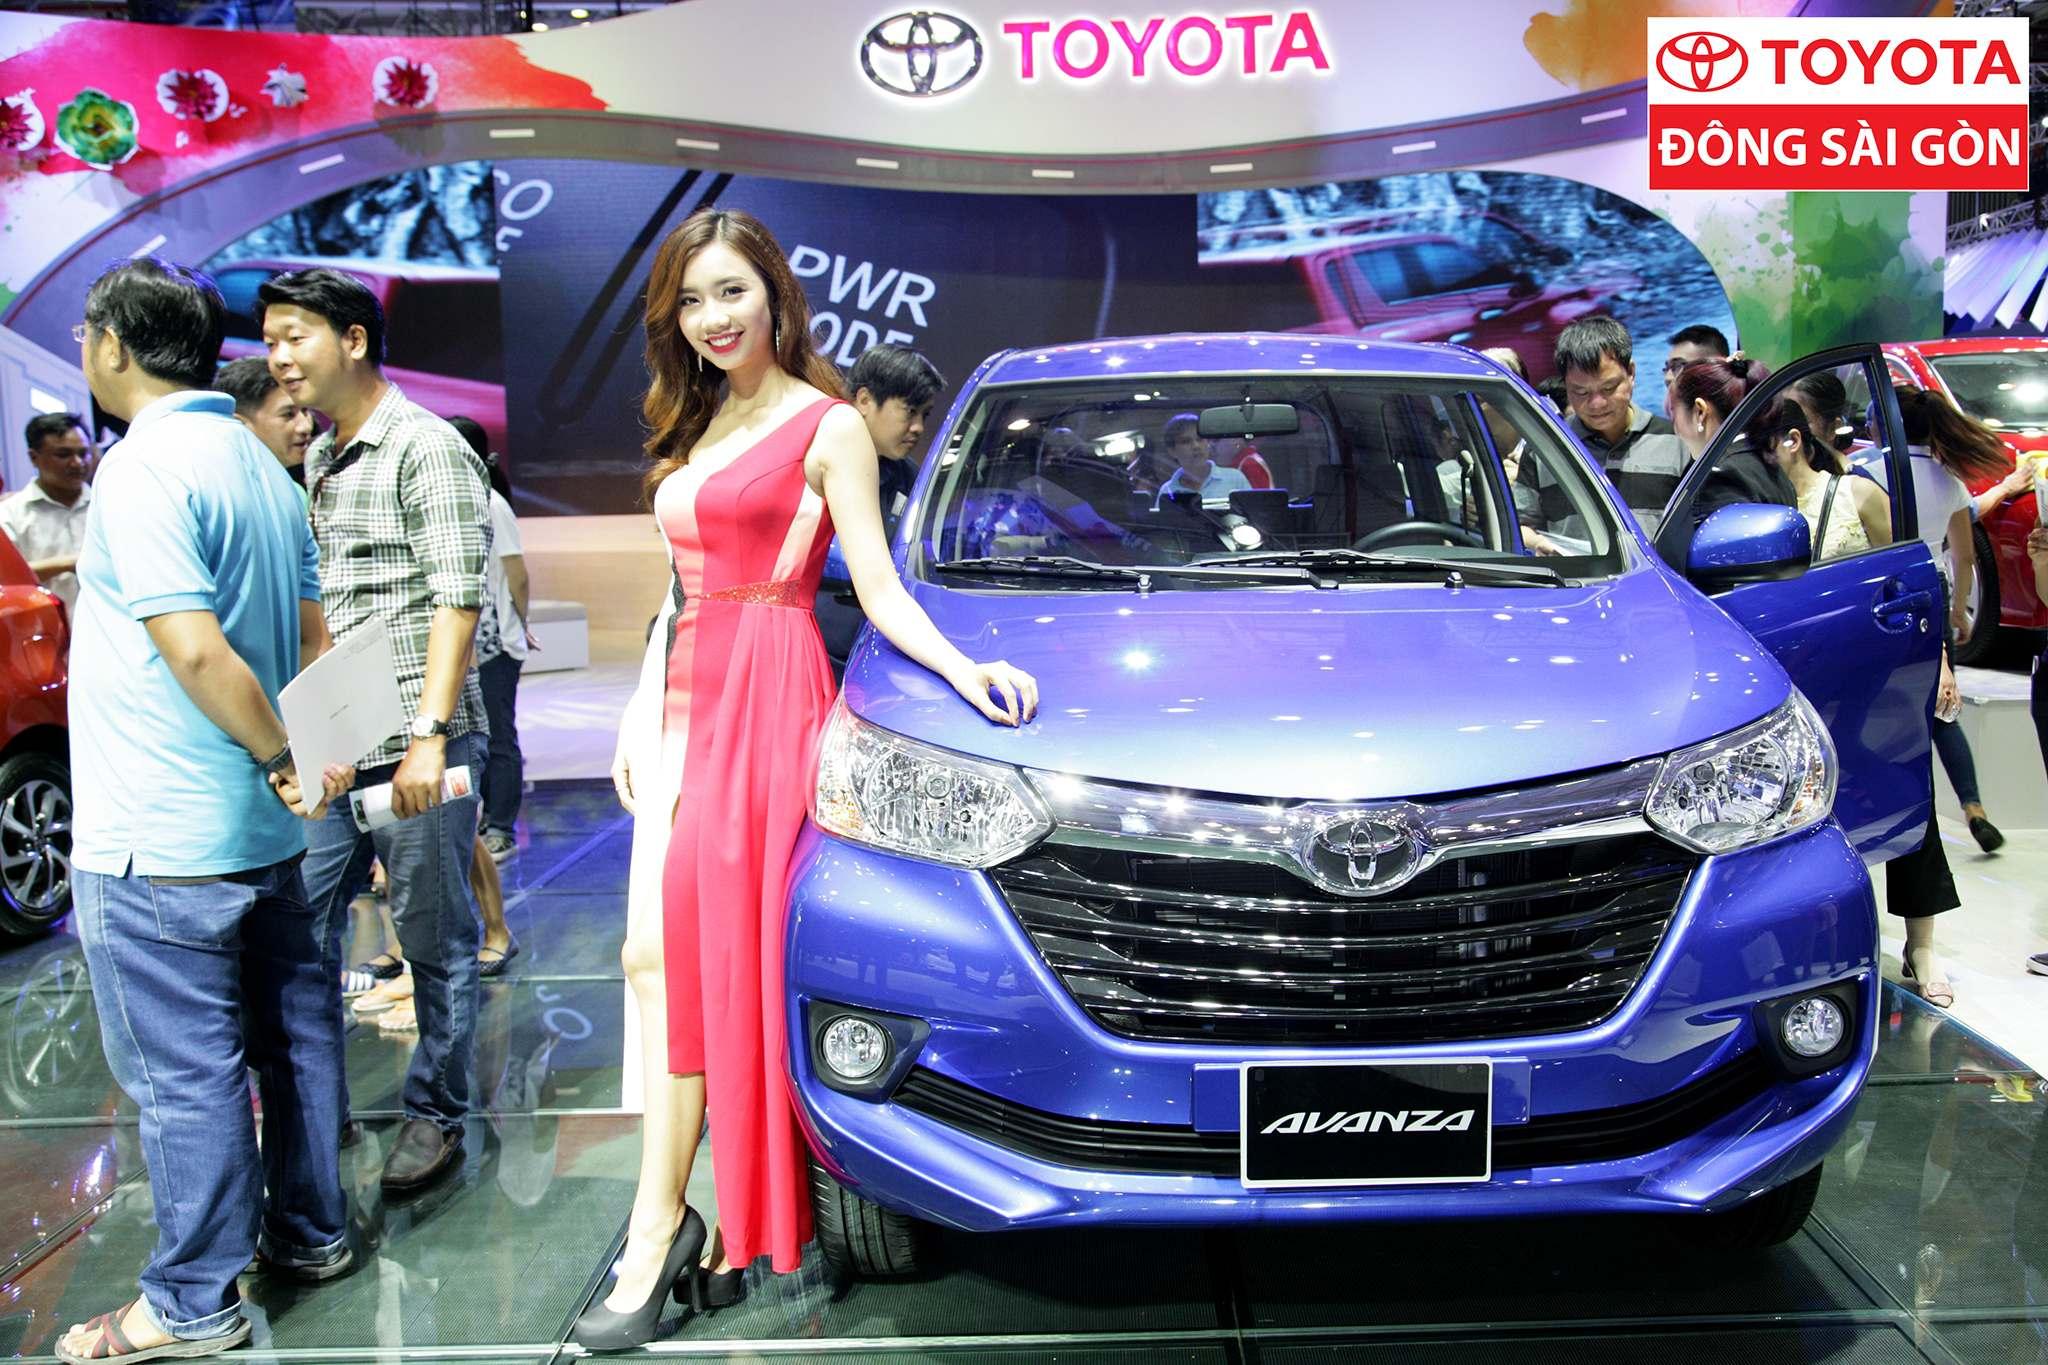 vietnam motor show 20171 Toyota at Vietnam Motor Show 2017